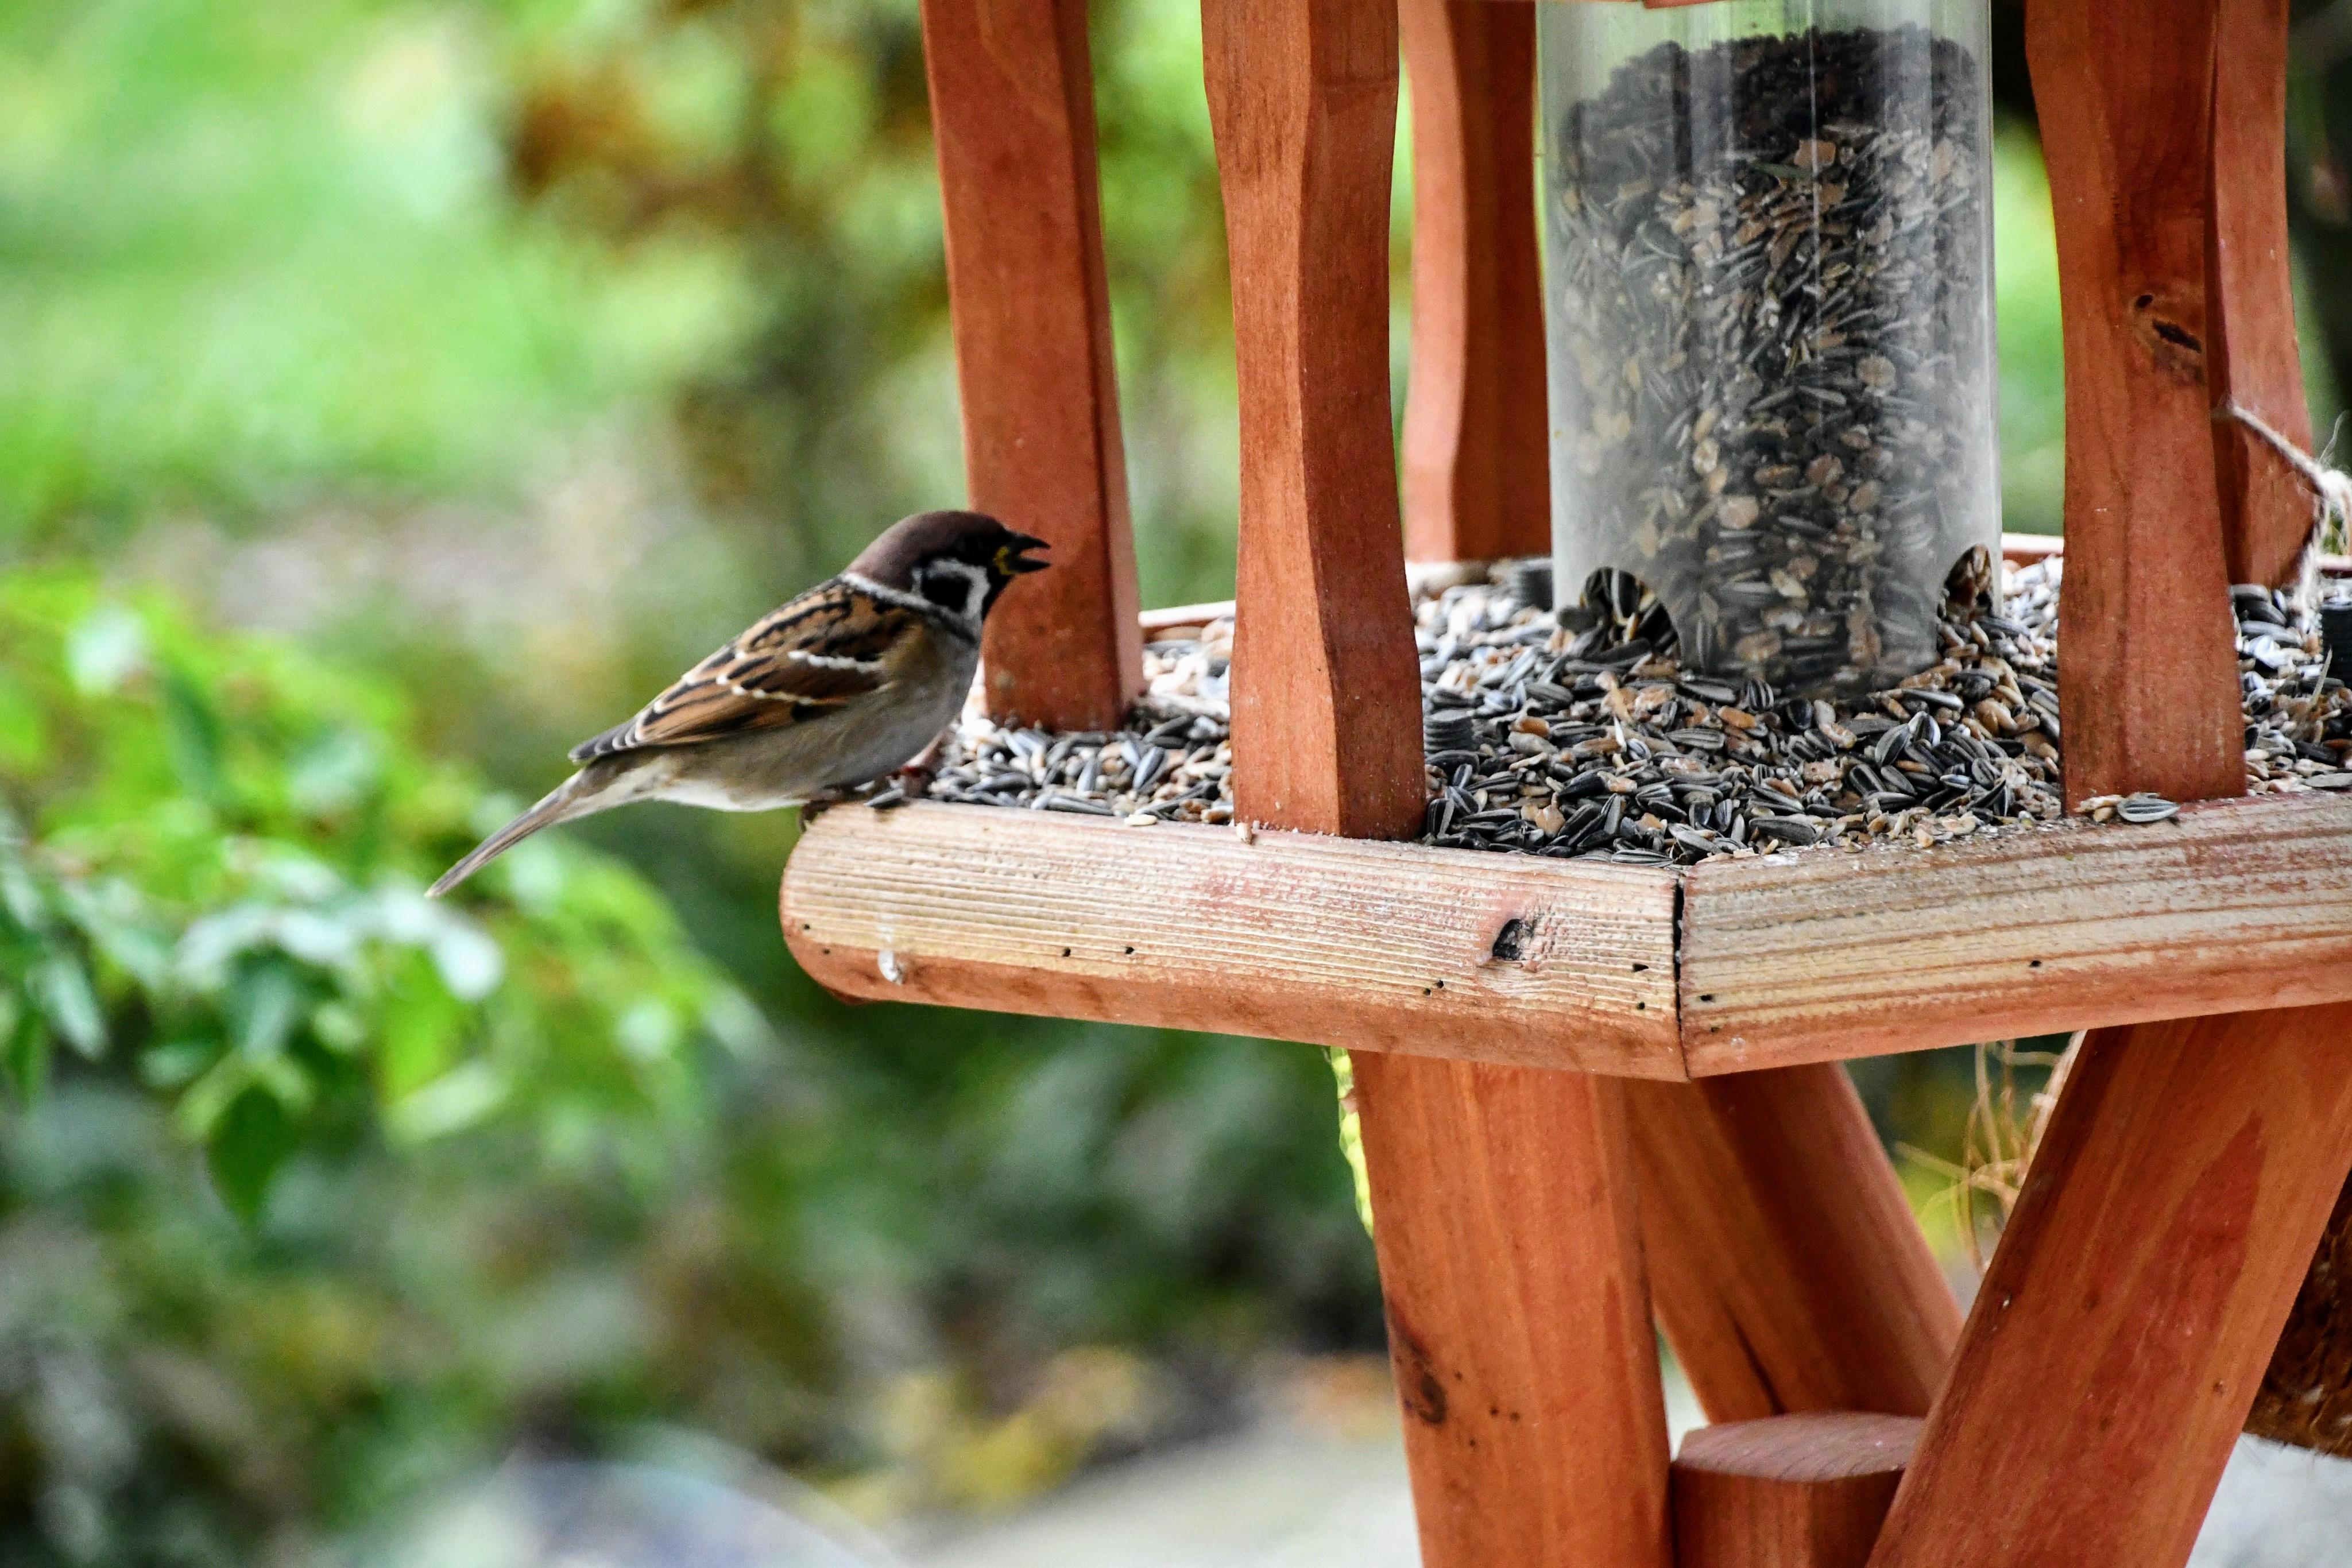 unknown-bird-sparrow-perhaps-3